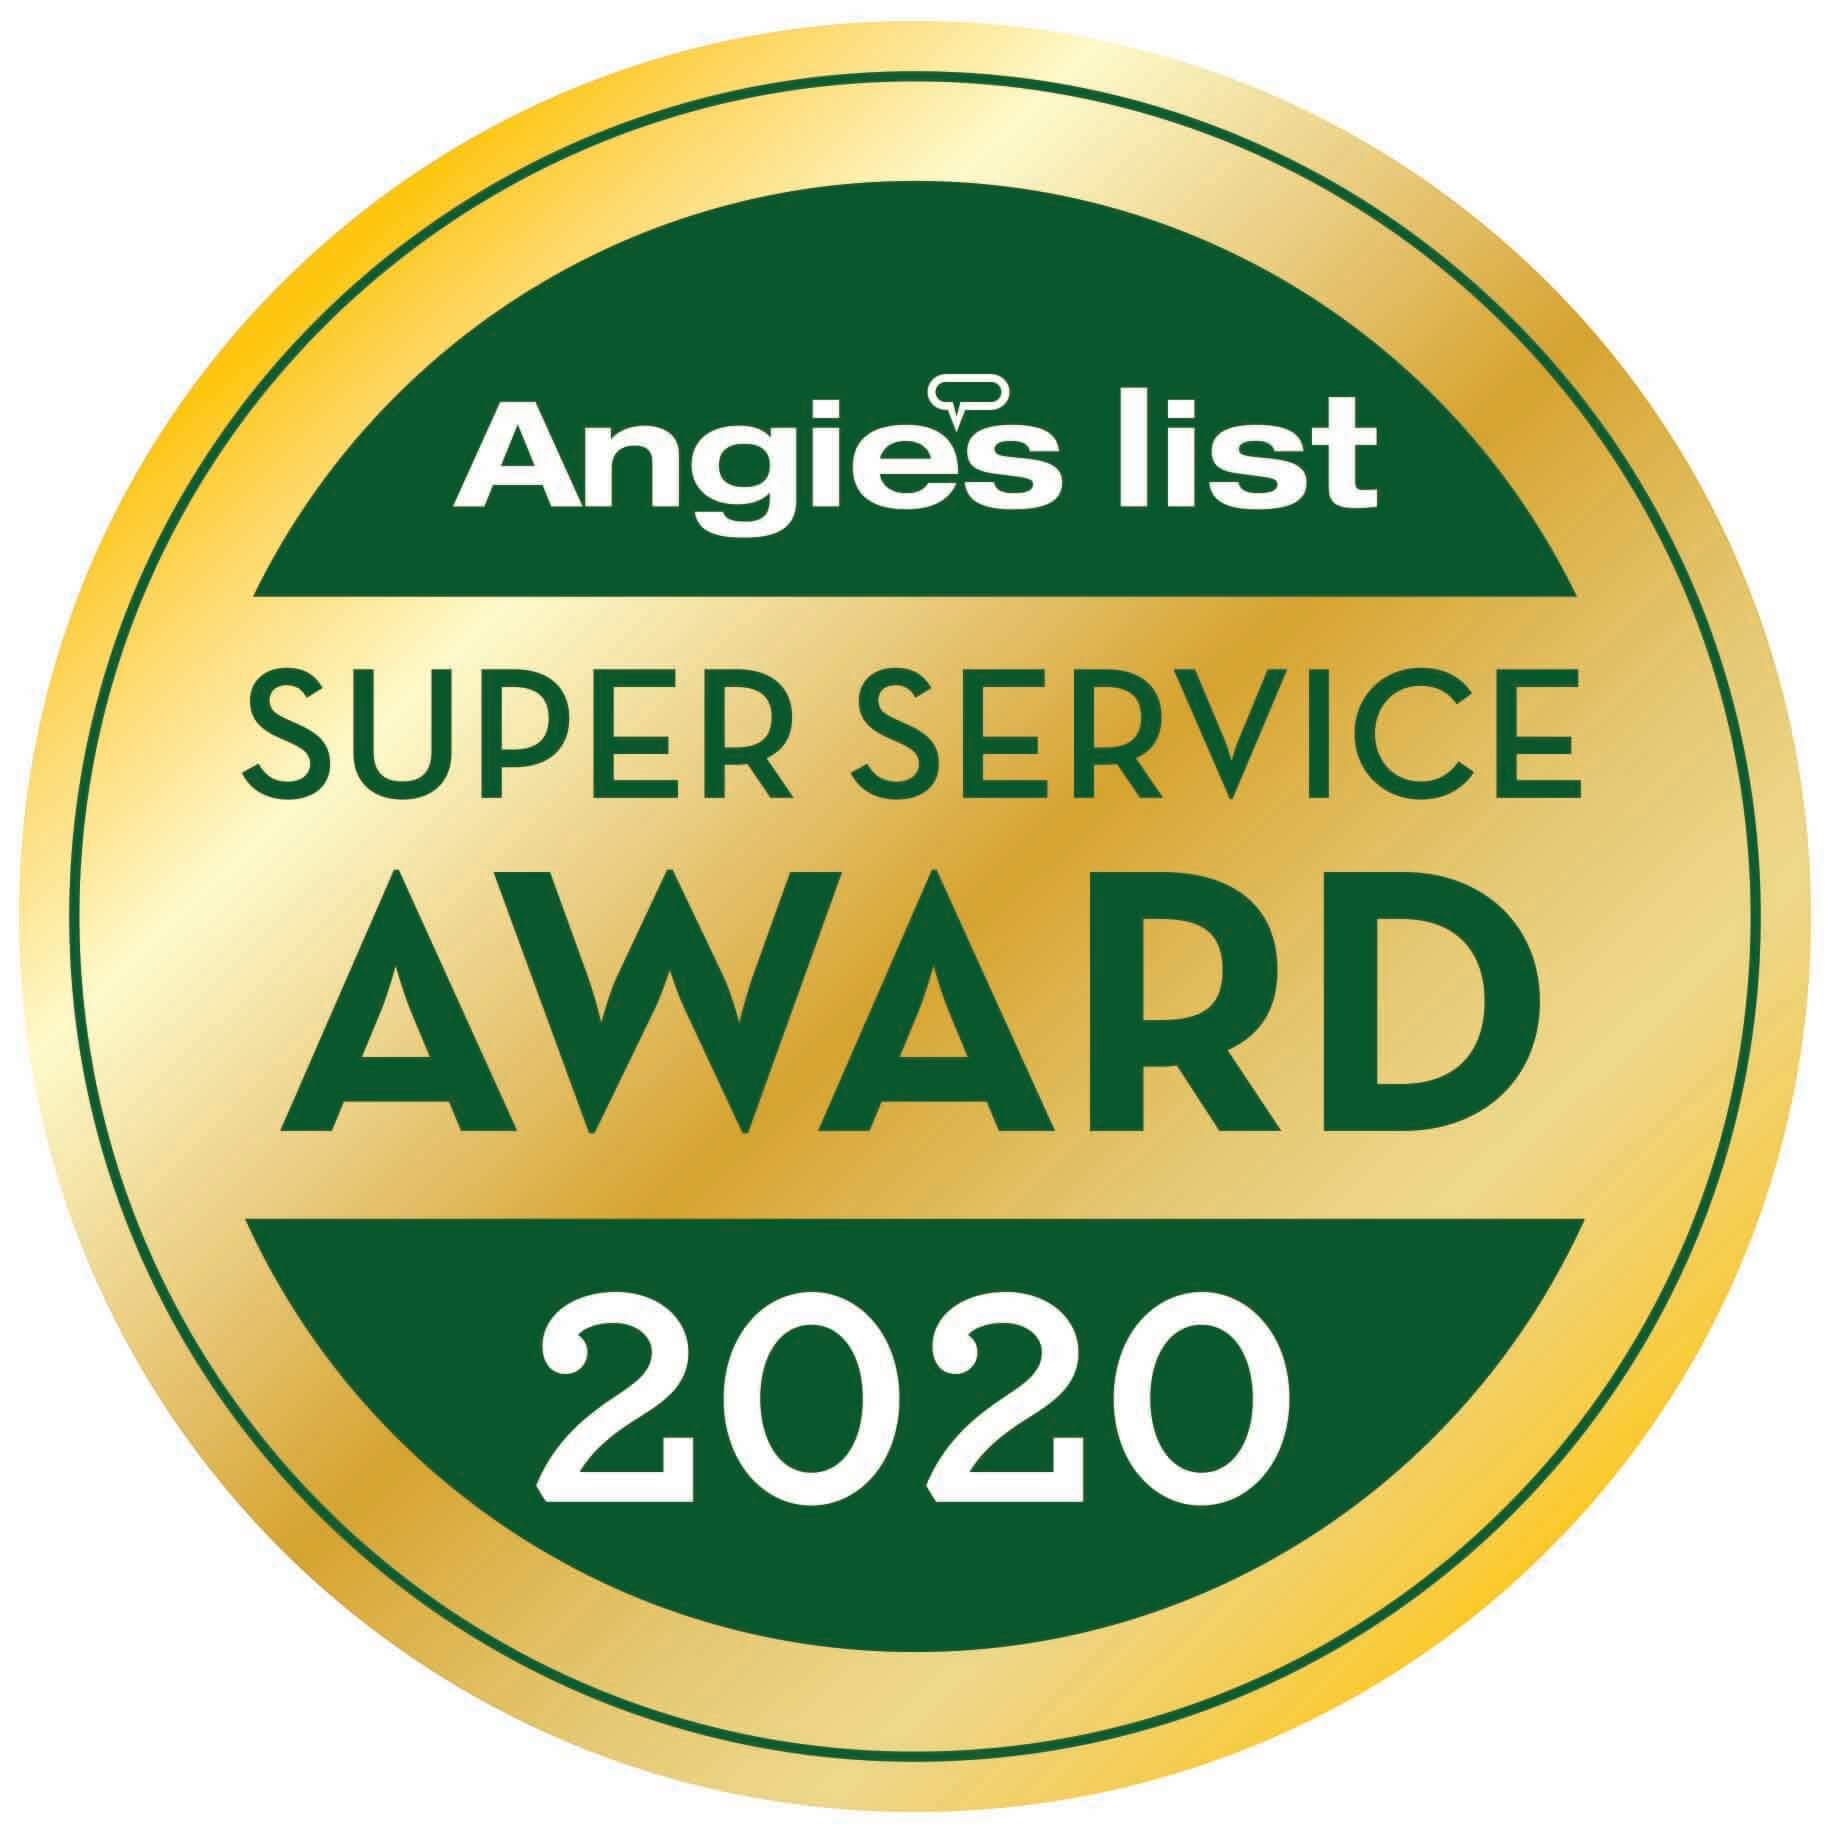 Angies List Award 2020